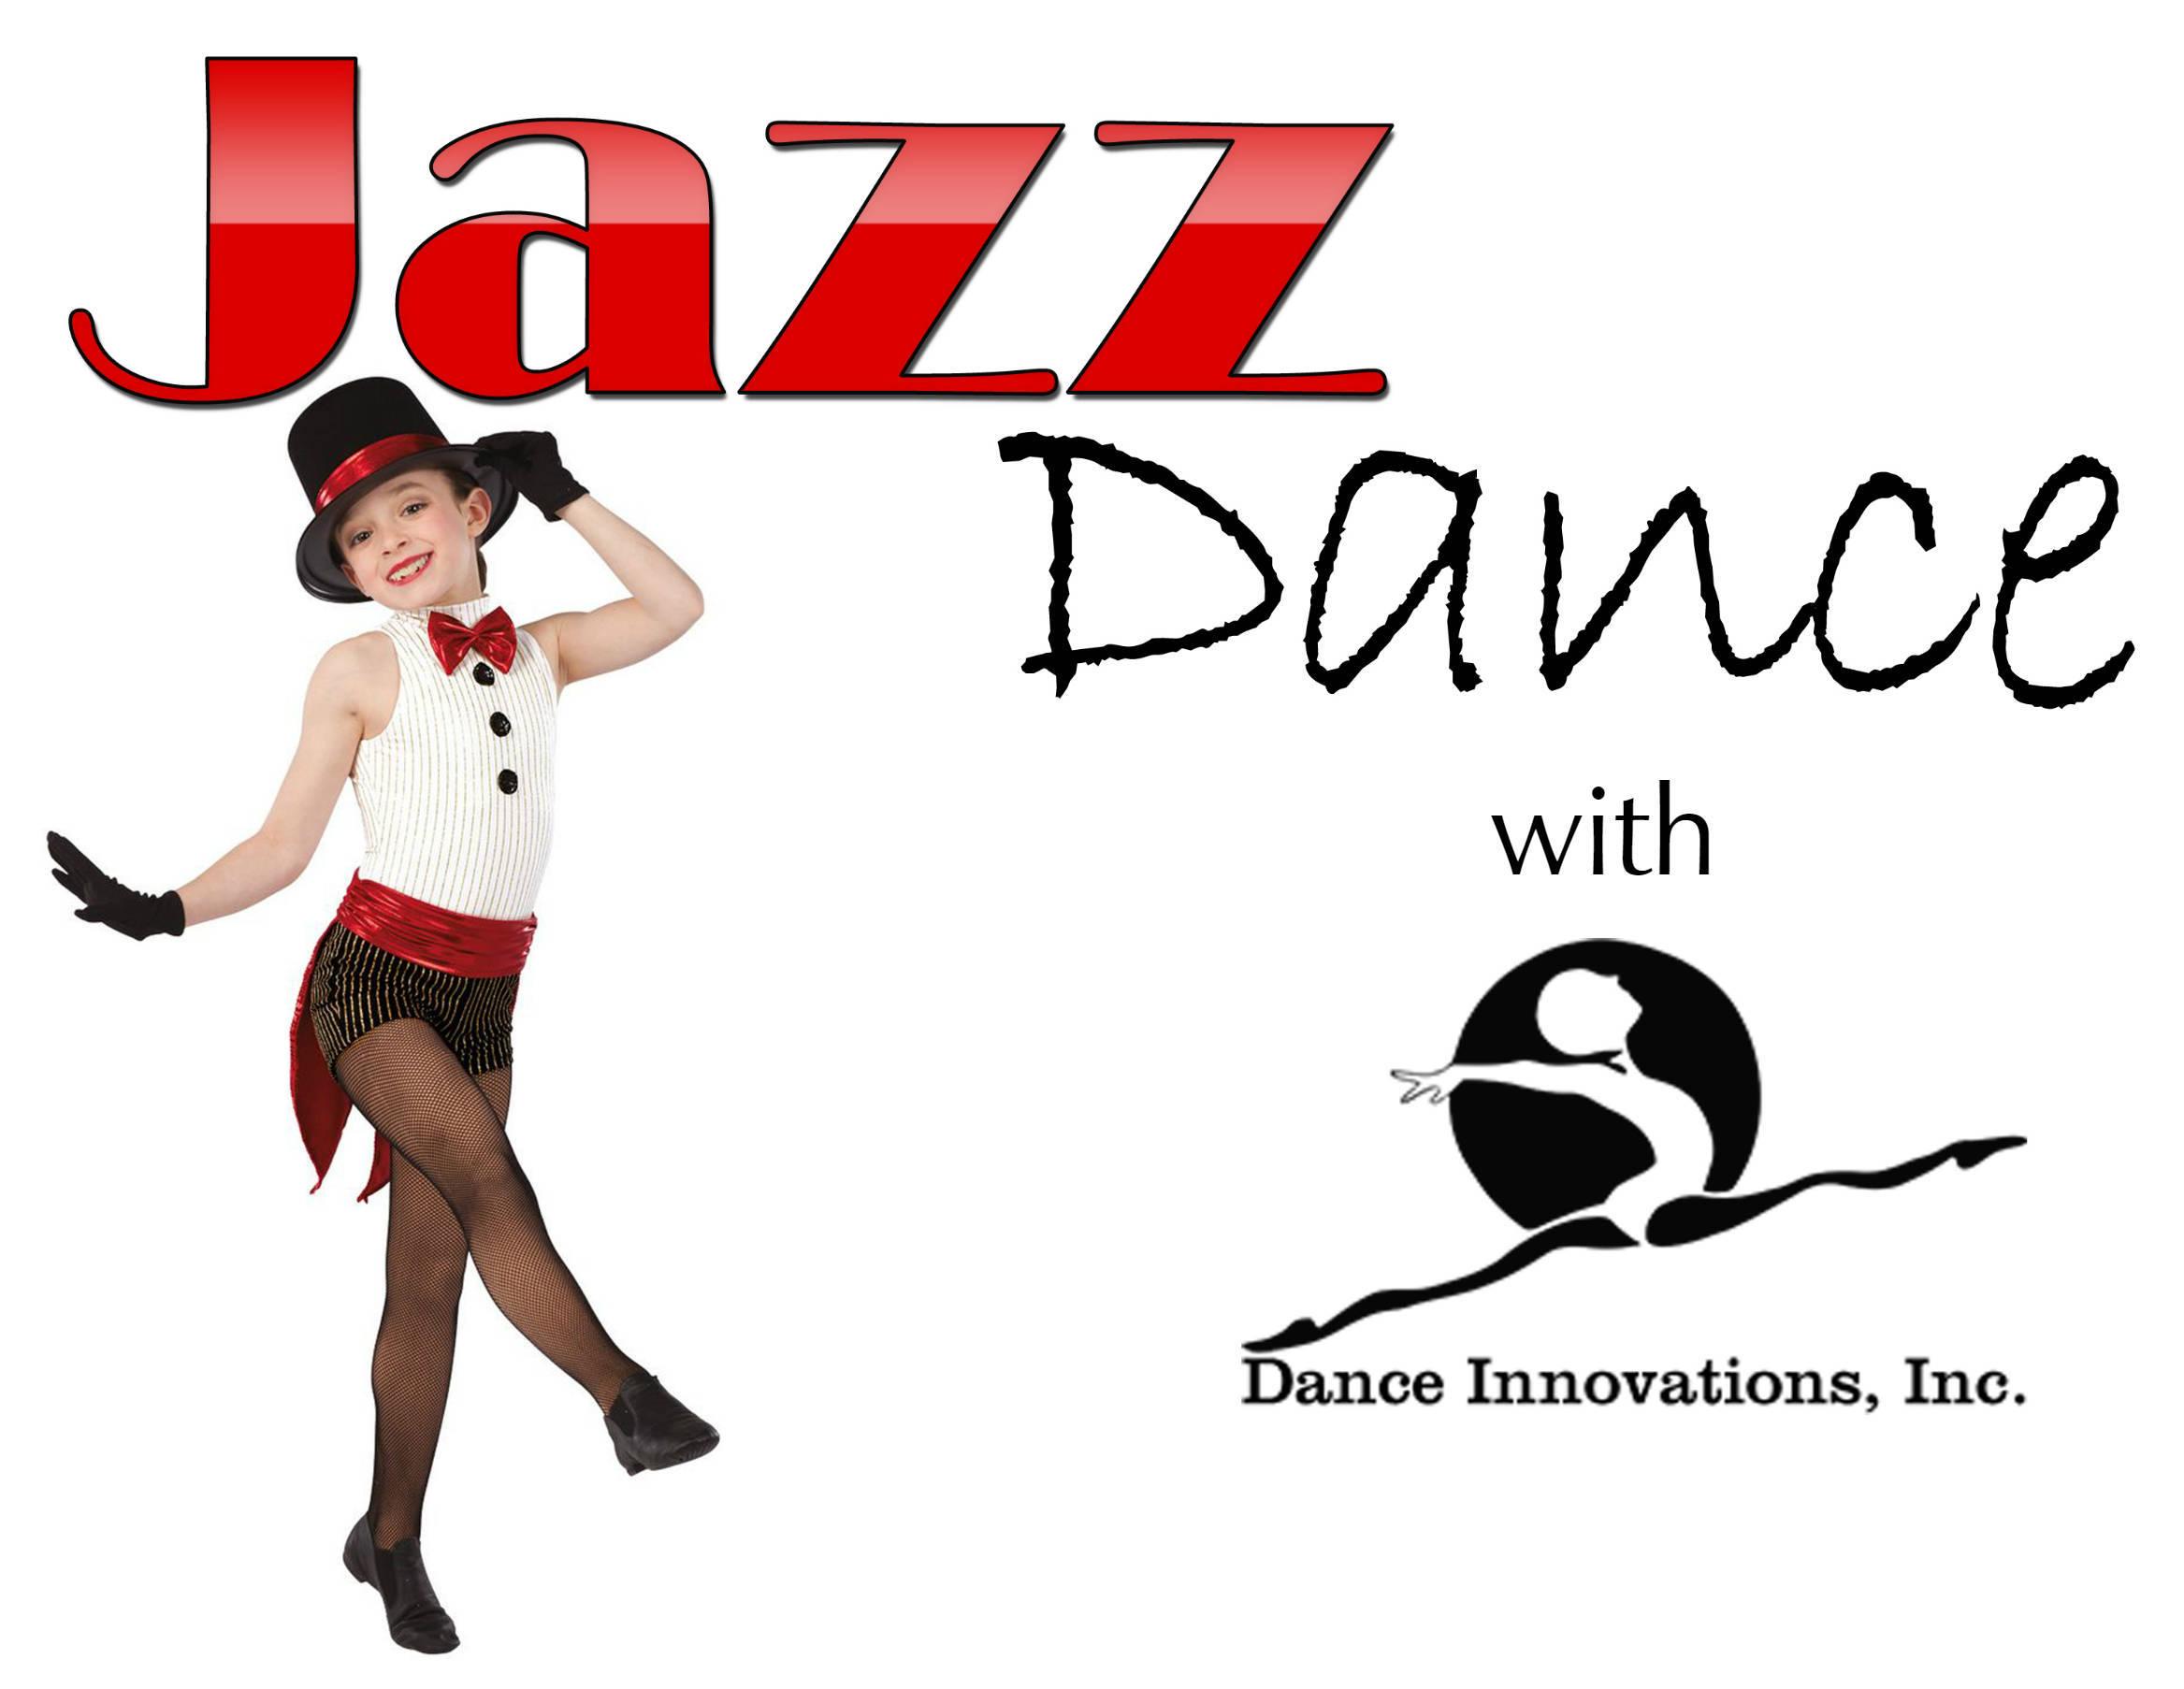 d4c04d9b18ac3c81df27_Jazzdance.jpg